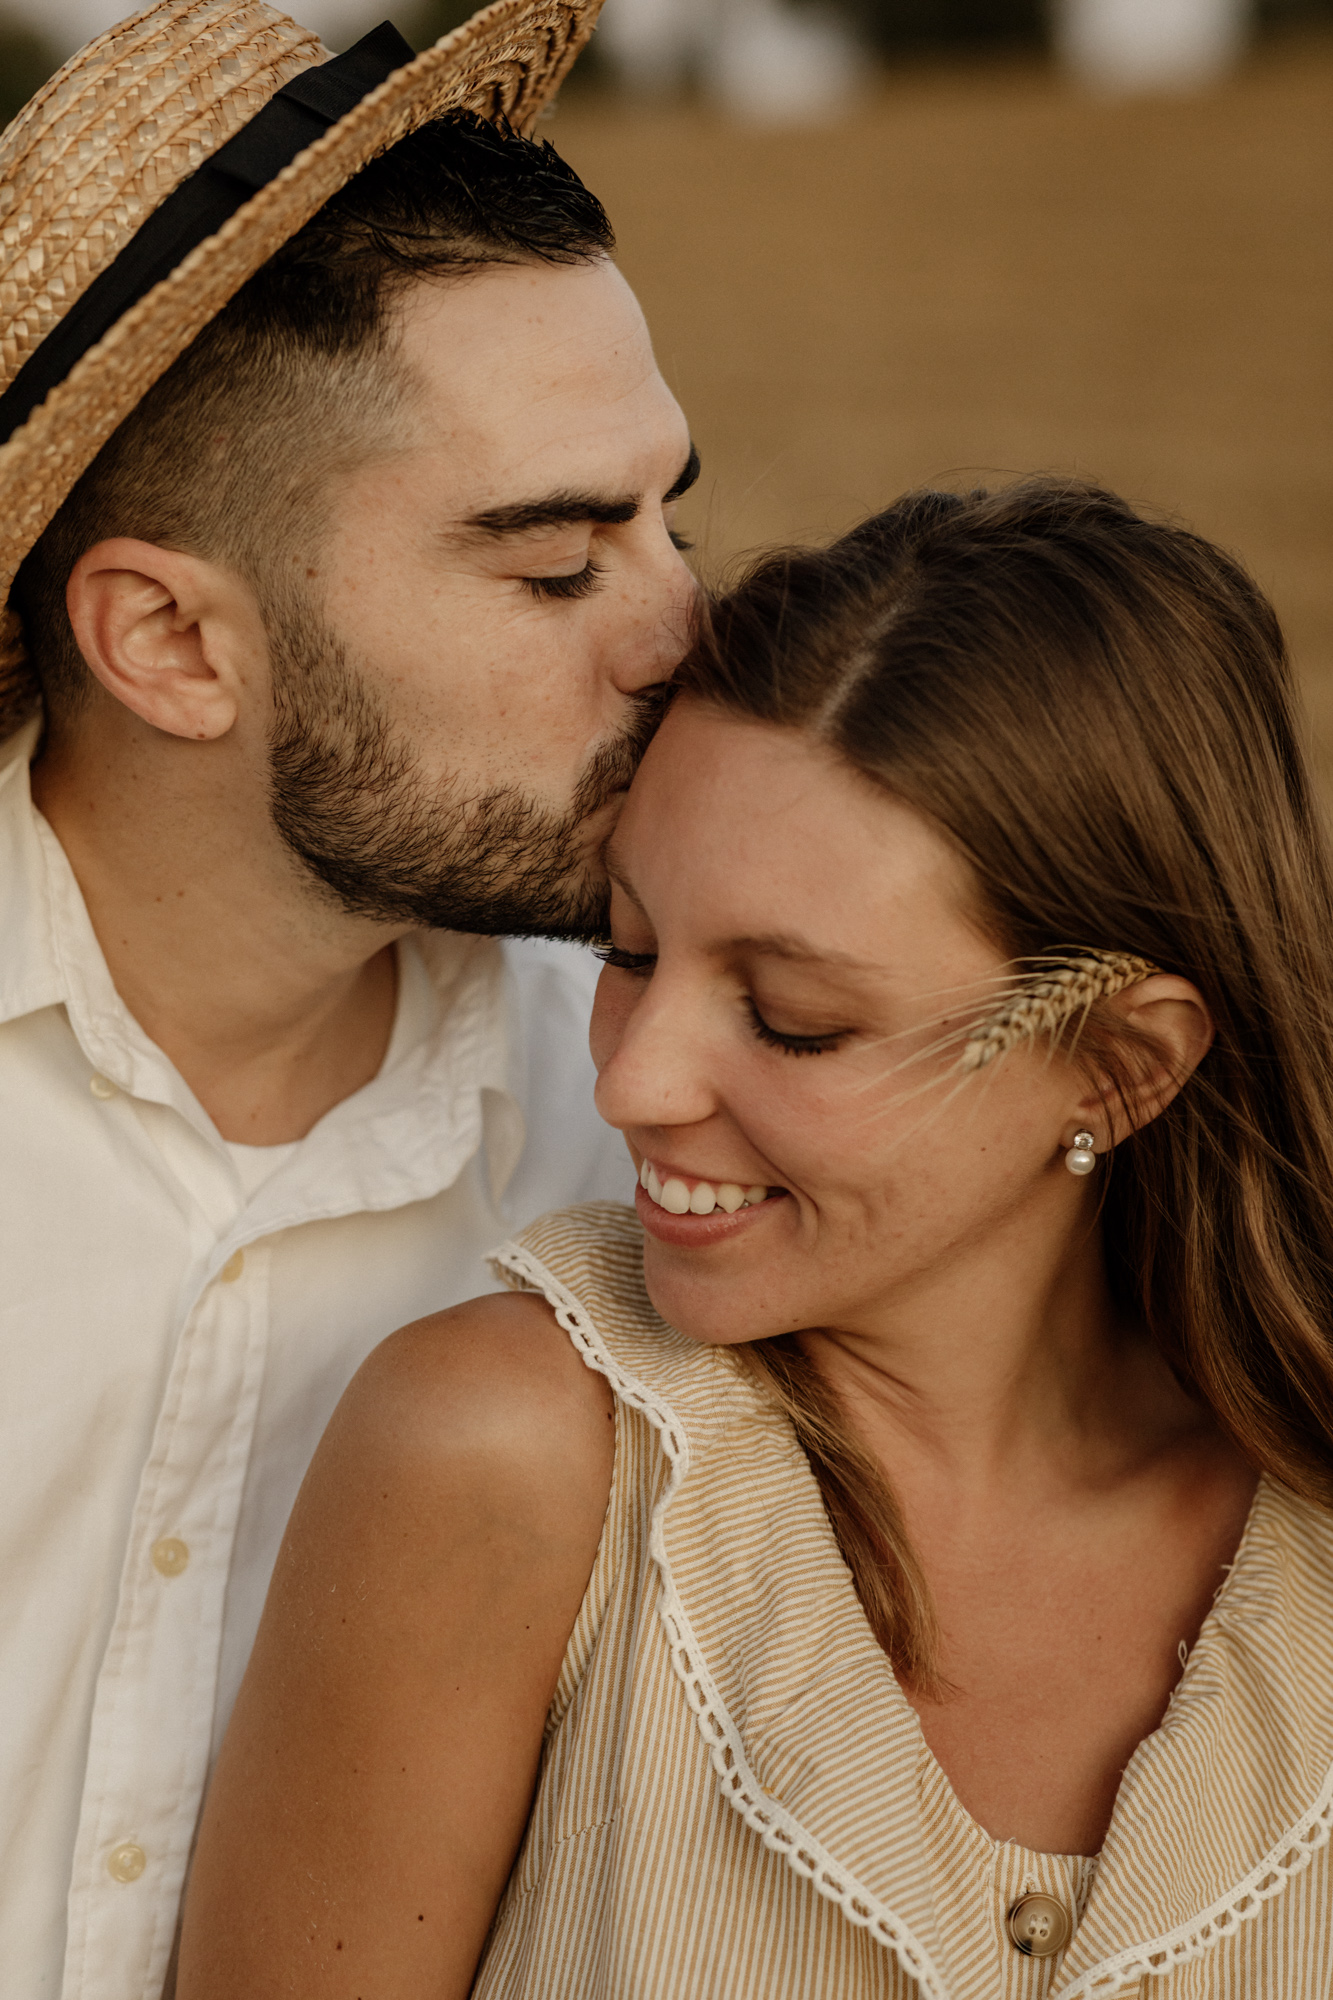 Lima-de-miguel-fotografo-boda-pareja-barcelona-7